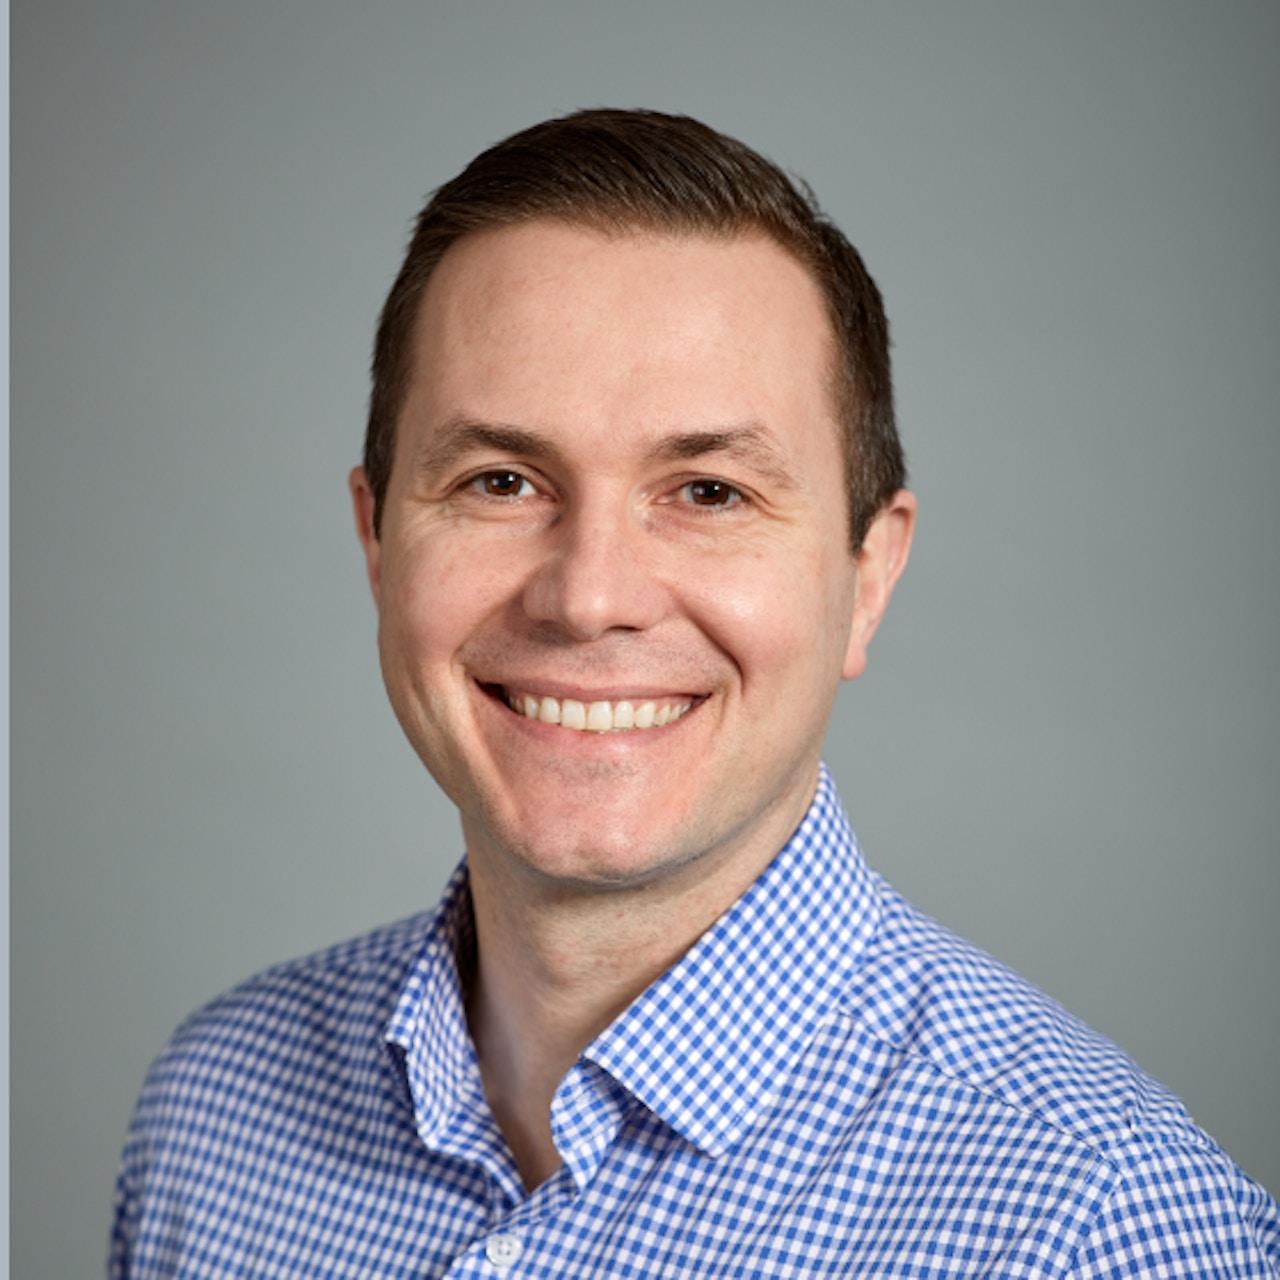 Kyle O'Meara - Vice President of Corporate Development